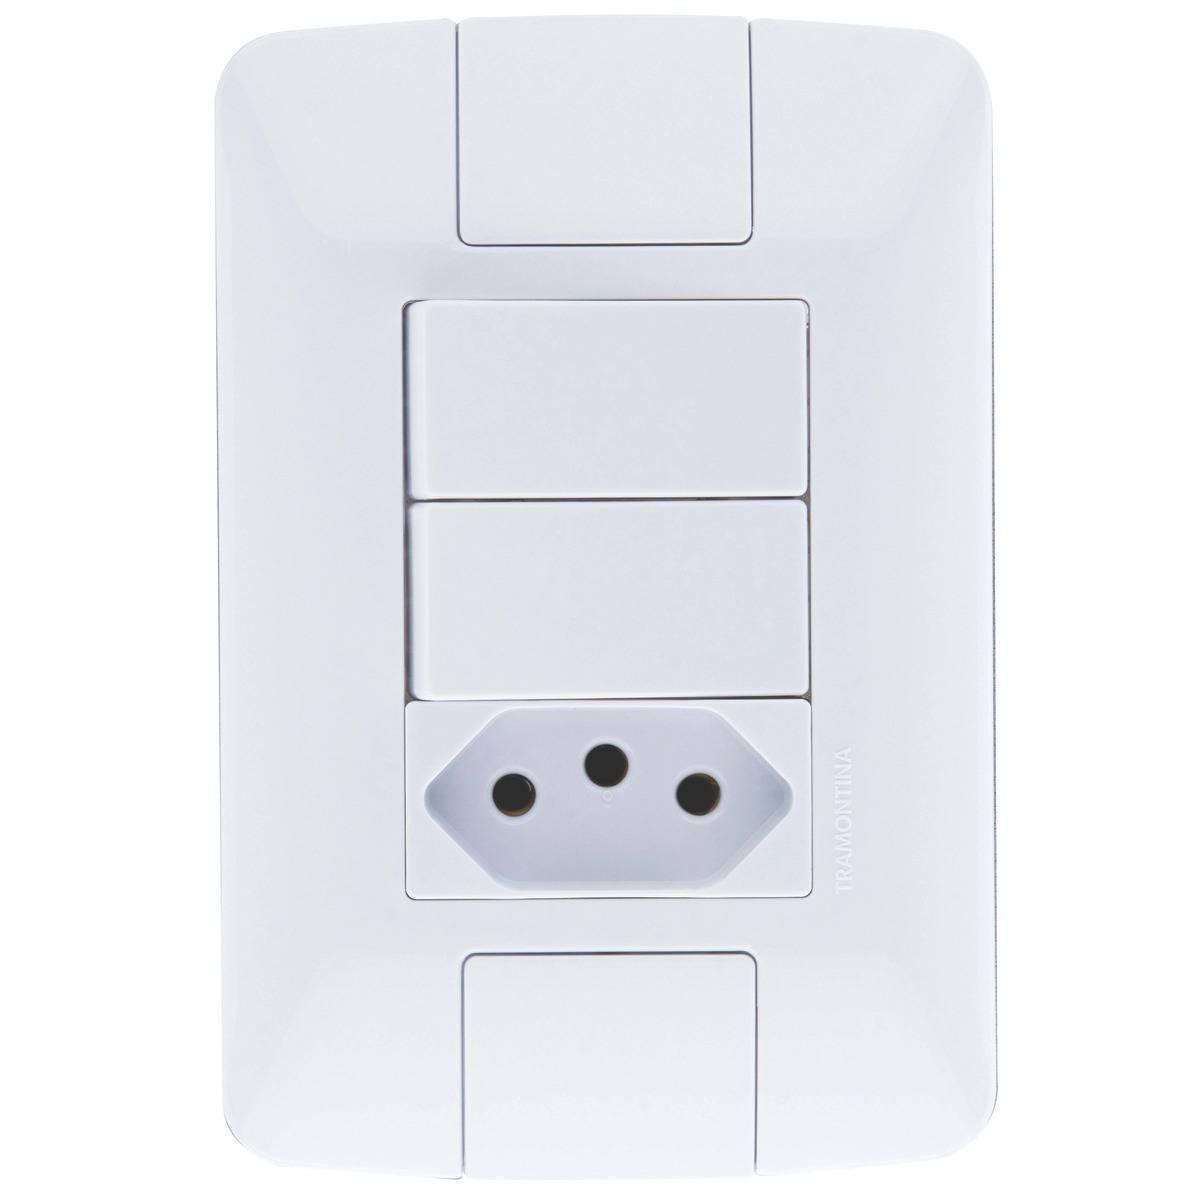 Conjunto Montado Aria 4x2 2 Interruptores Simples 6a + 1 Tom - LCGELETRO